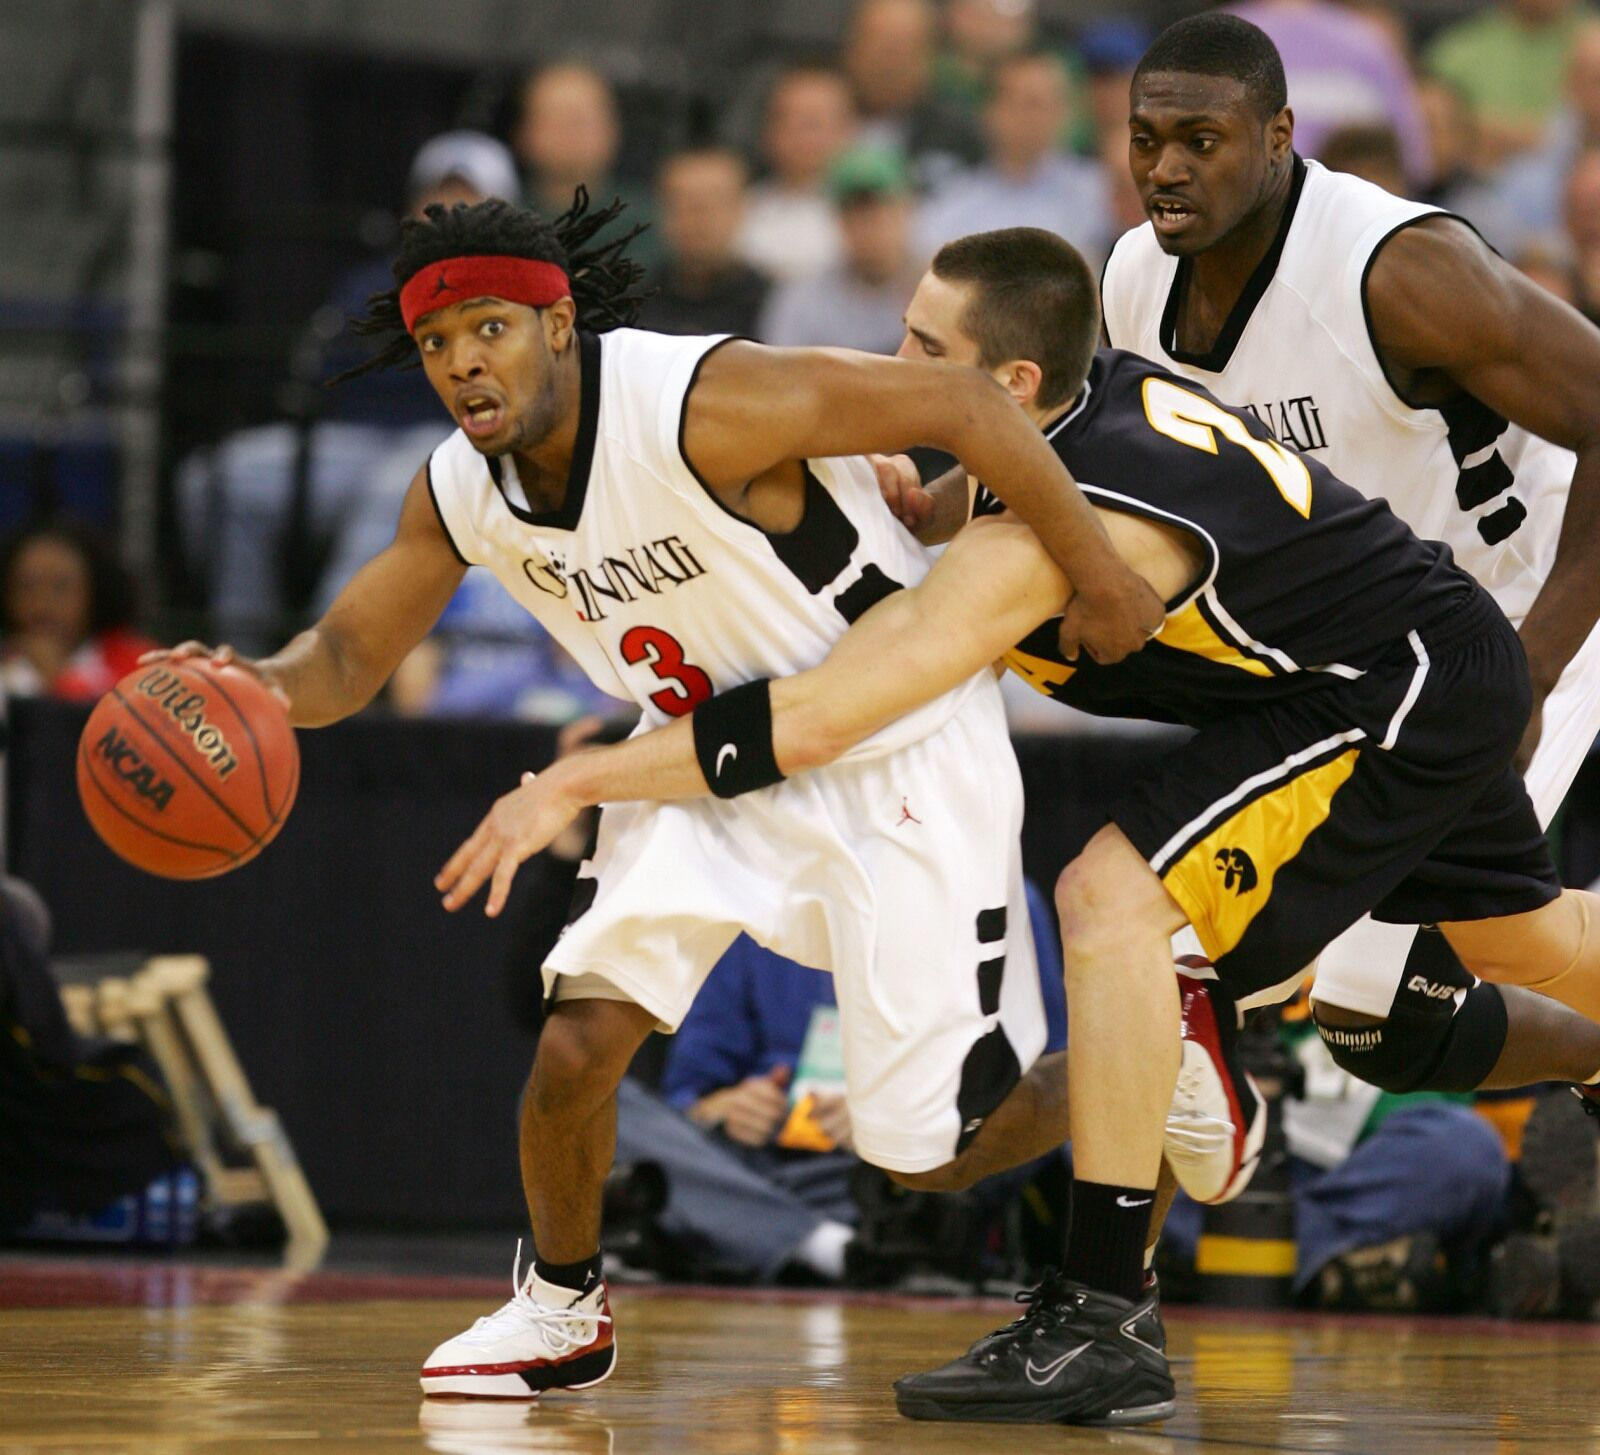 brand new 9f9fb 72b29 Iowa basketball  Getting an insider s perspective on the Cincinnati Bearcats